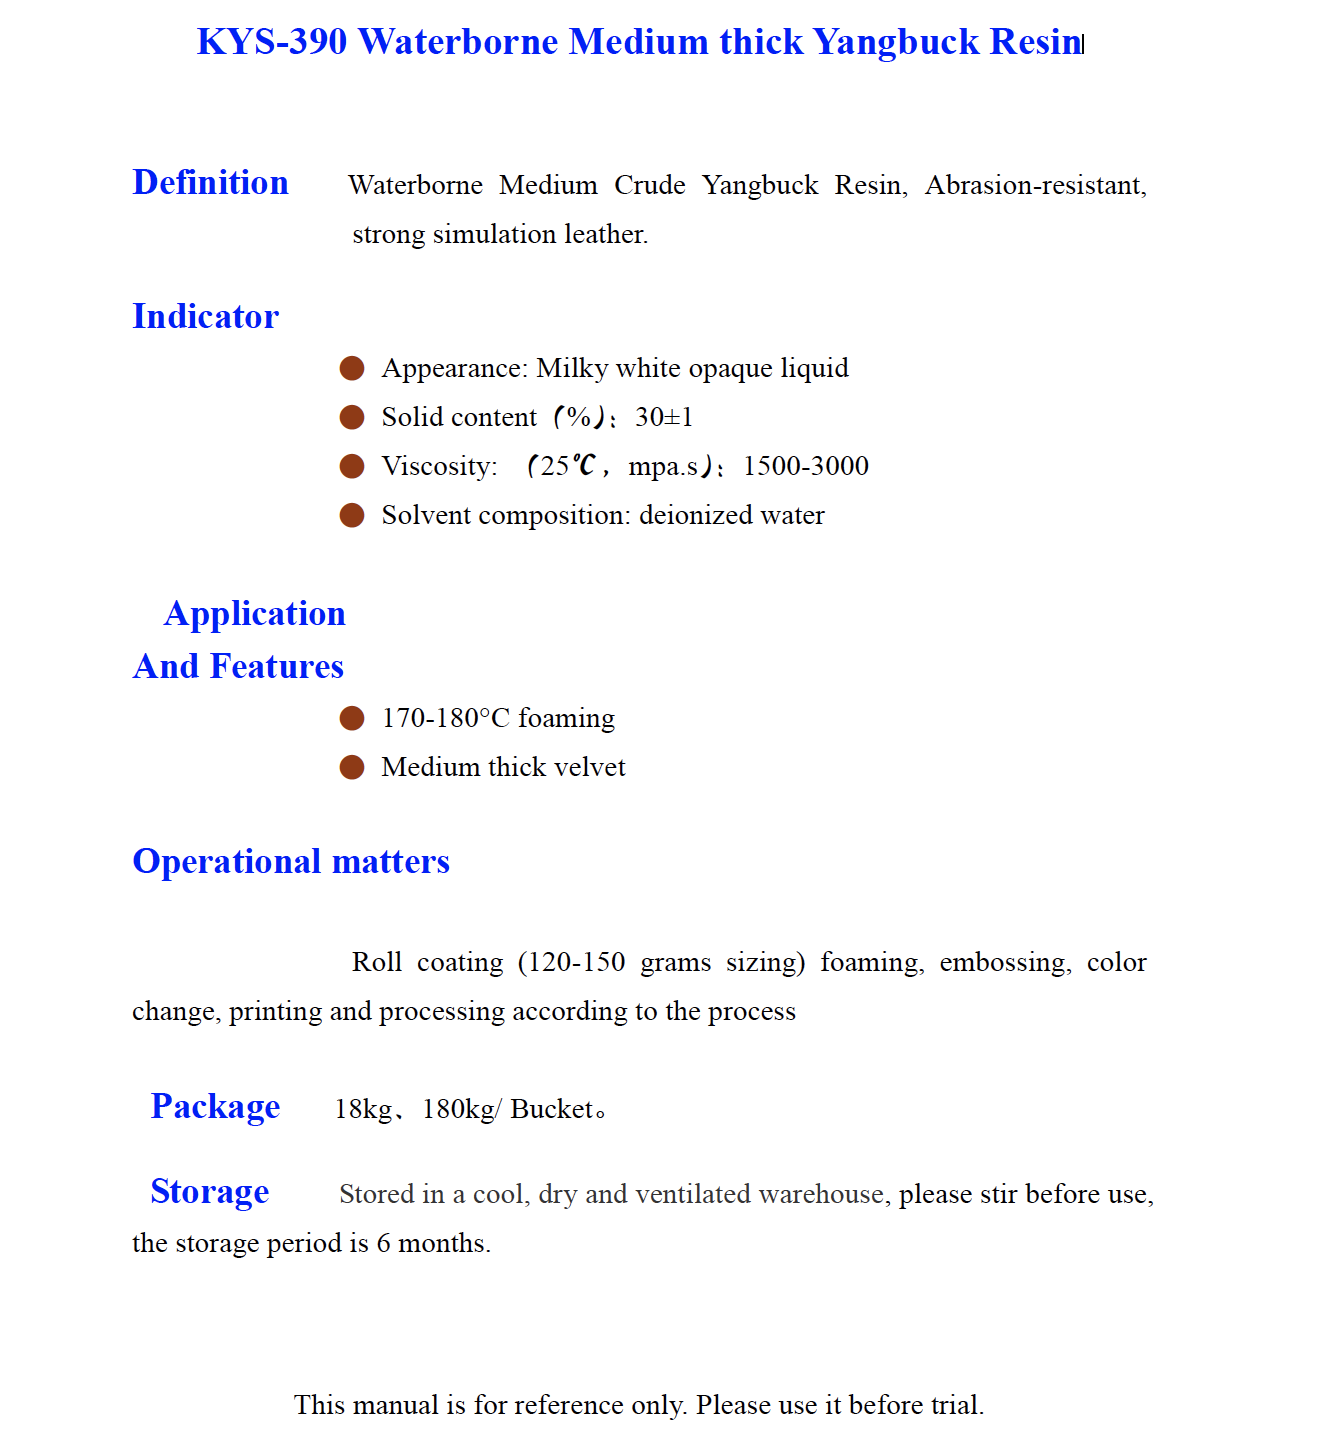 KYS 390 Waterborne Medium thick Yangbuck Resin